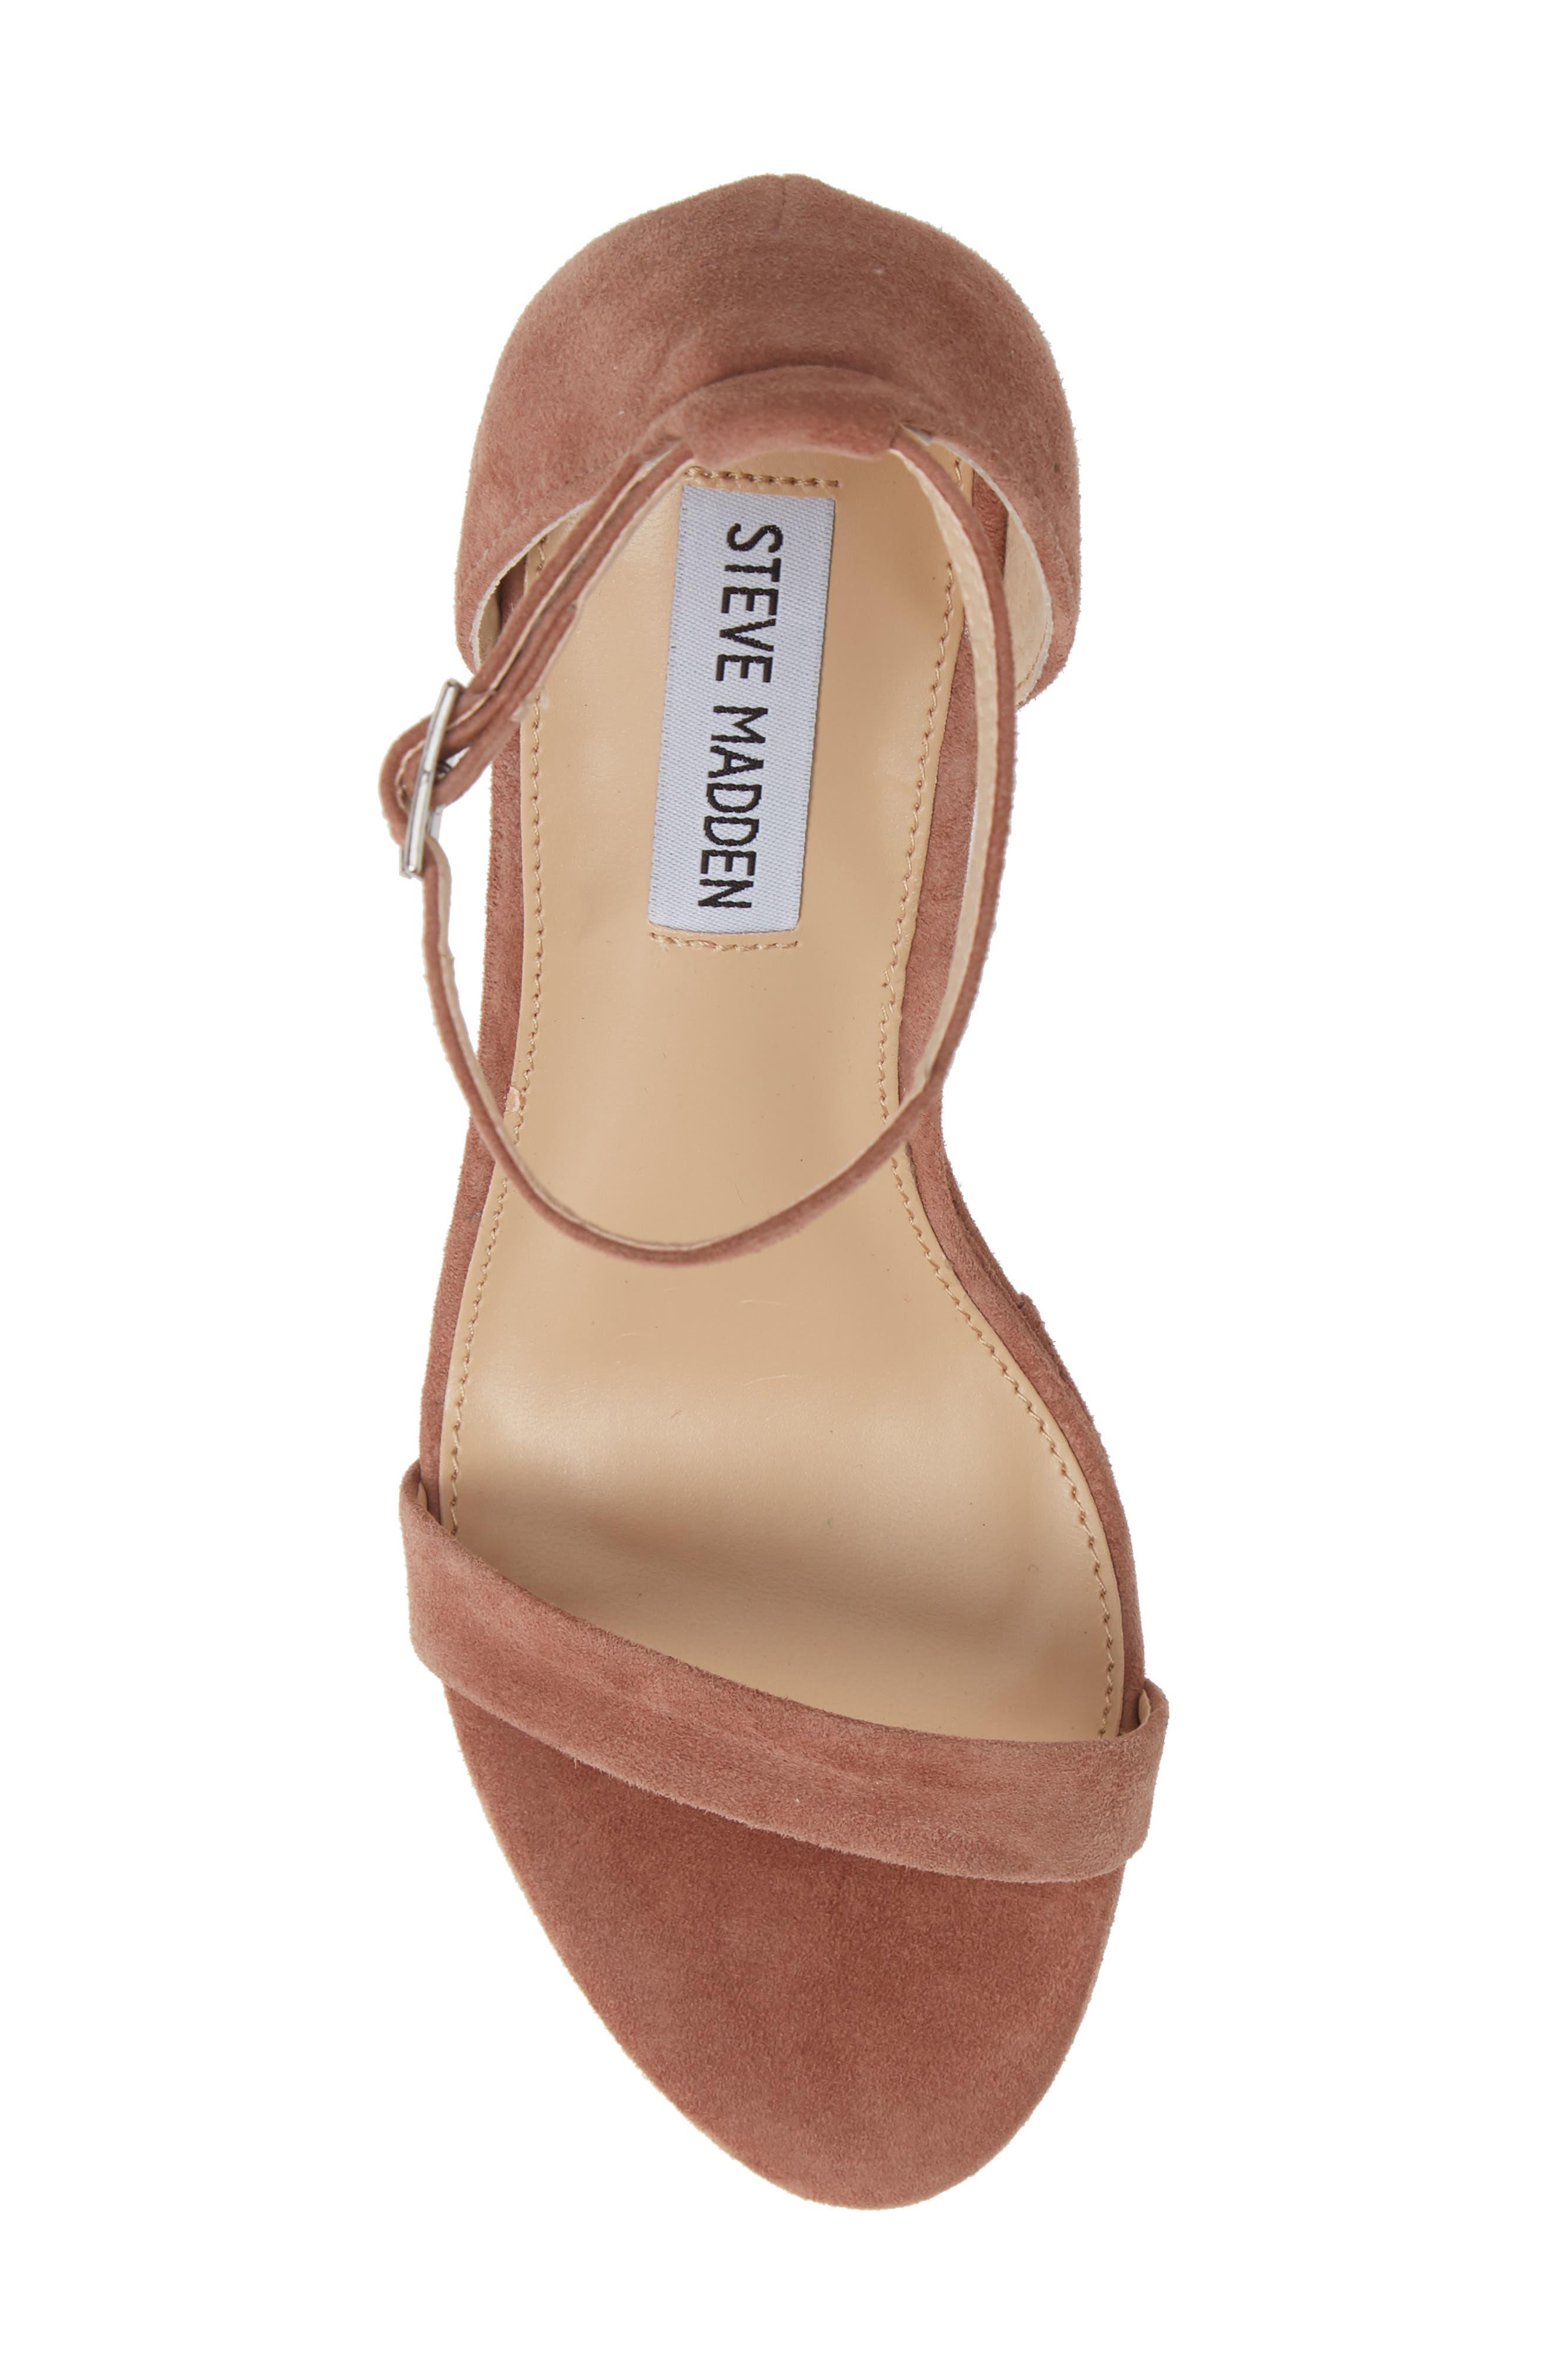 Succeed Platform Wedge Sandal,                             Alternate thumbnail 5, color,                             TAN SUEDE